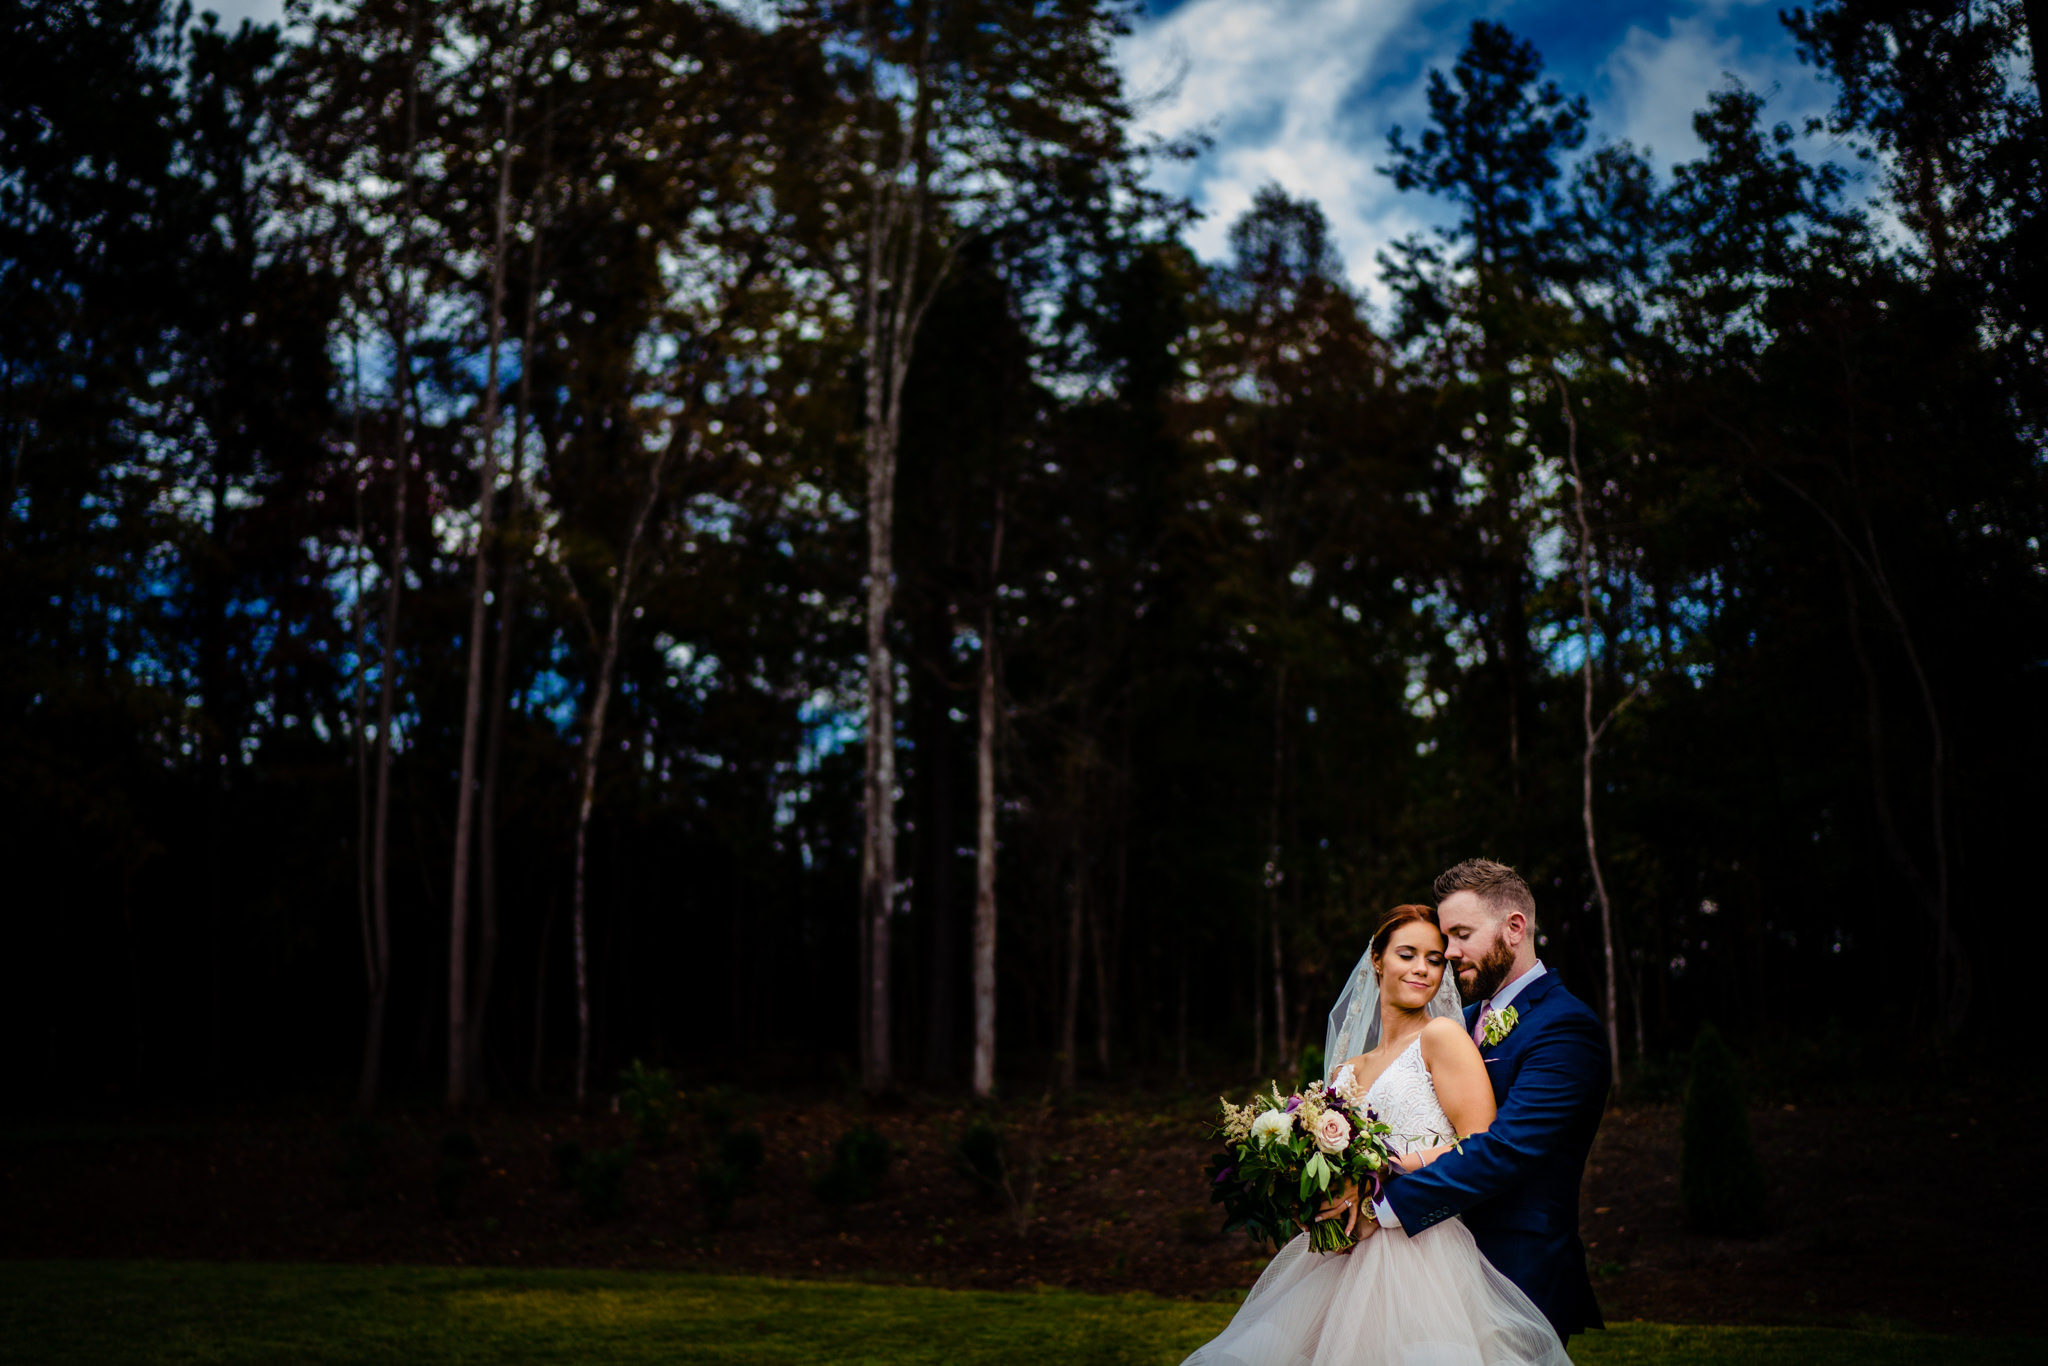 Emily&Ron-Chapel-hill-wedding-barn-55.jpg